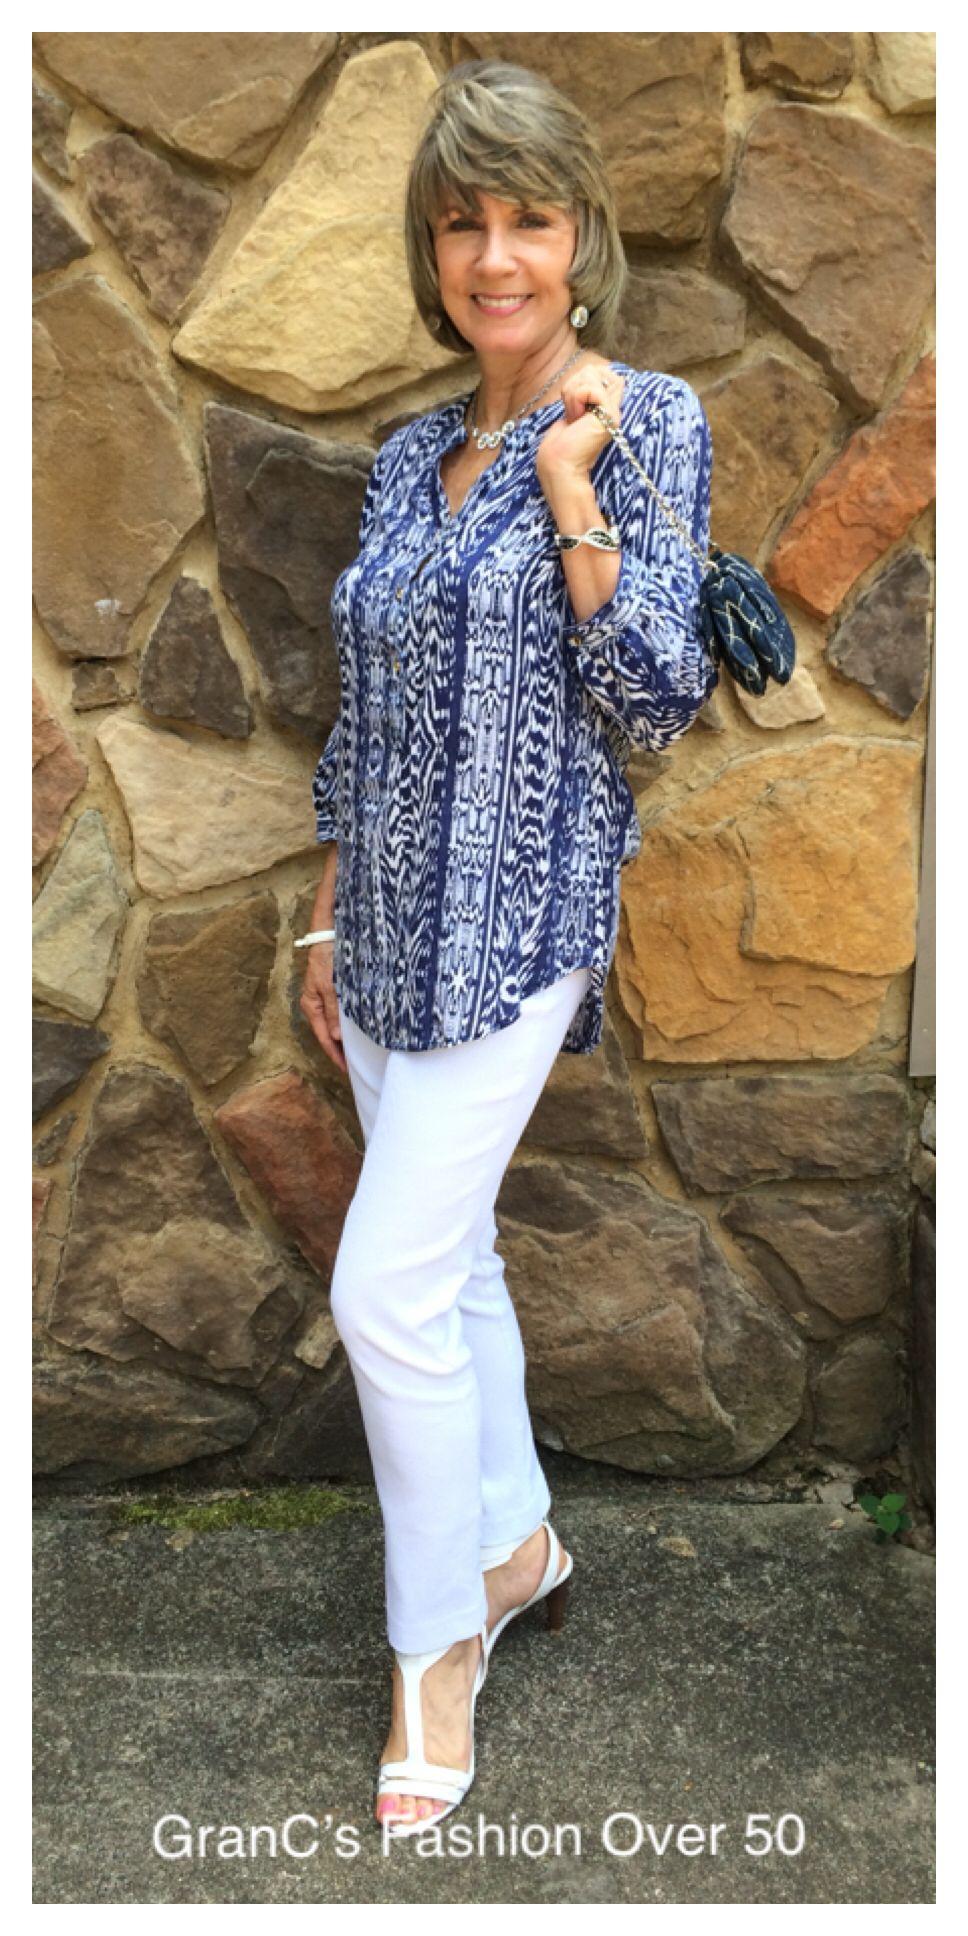 Senager Fashion Top Grand Greene Slacks Attyre Stein Mart Dress Sandals Cato Fashion Fashion Over 50 Fashion Outfits [ 1936 x 968 Pixel ]